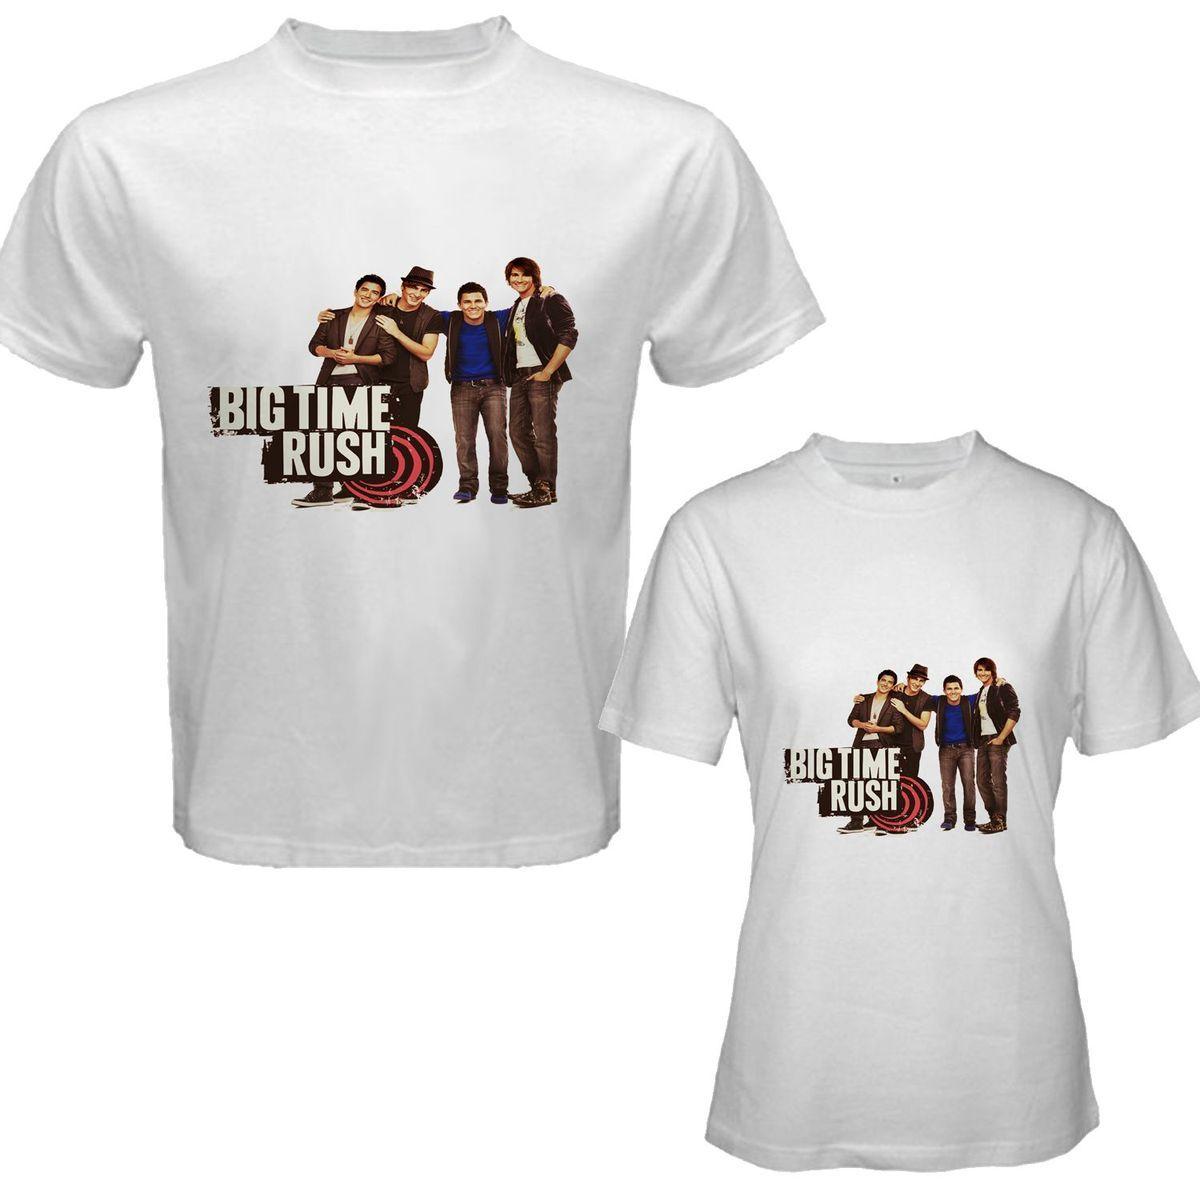 001 Big Time Rush CD Music Tour 2012 T Shirt Size s M L XL